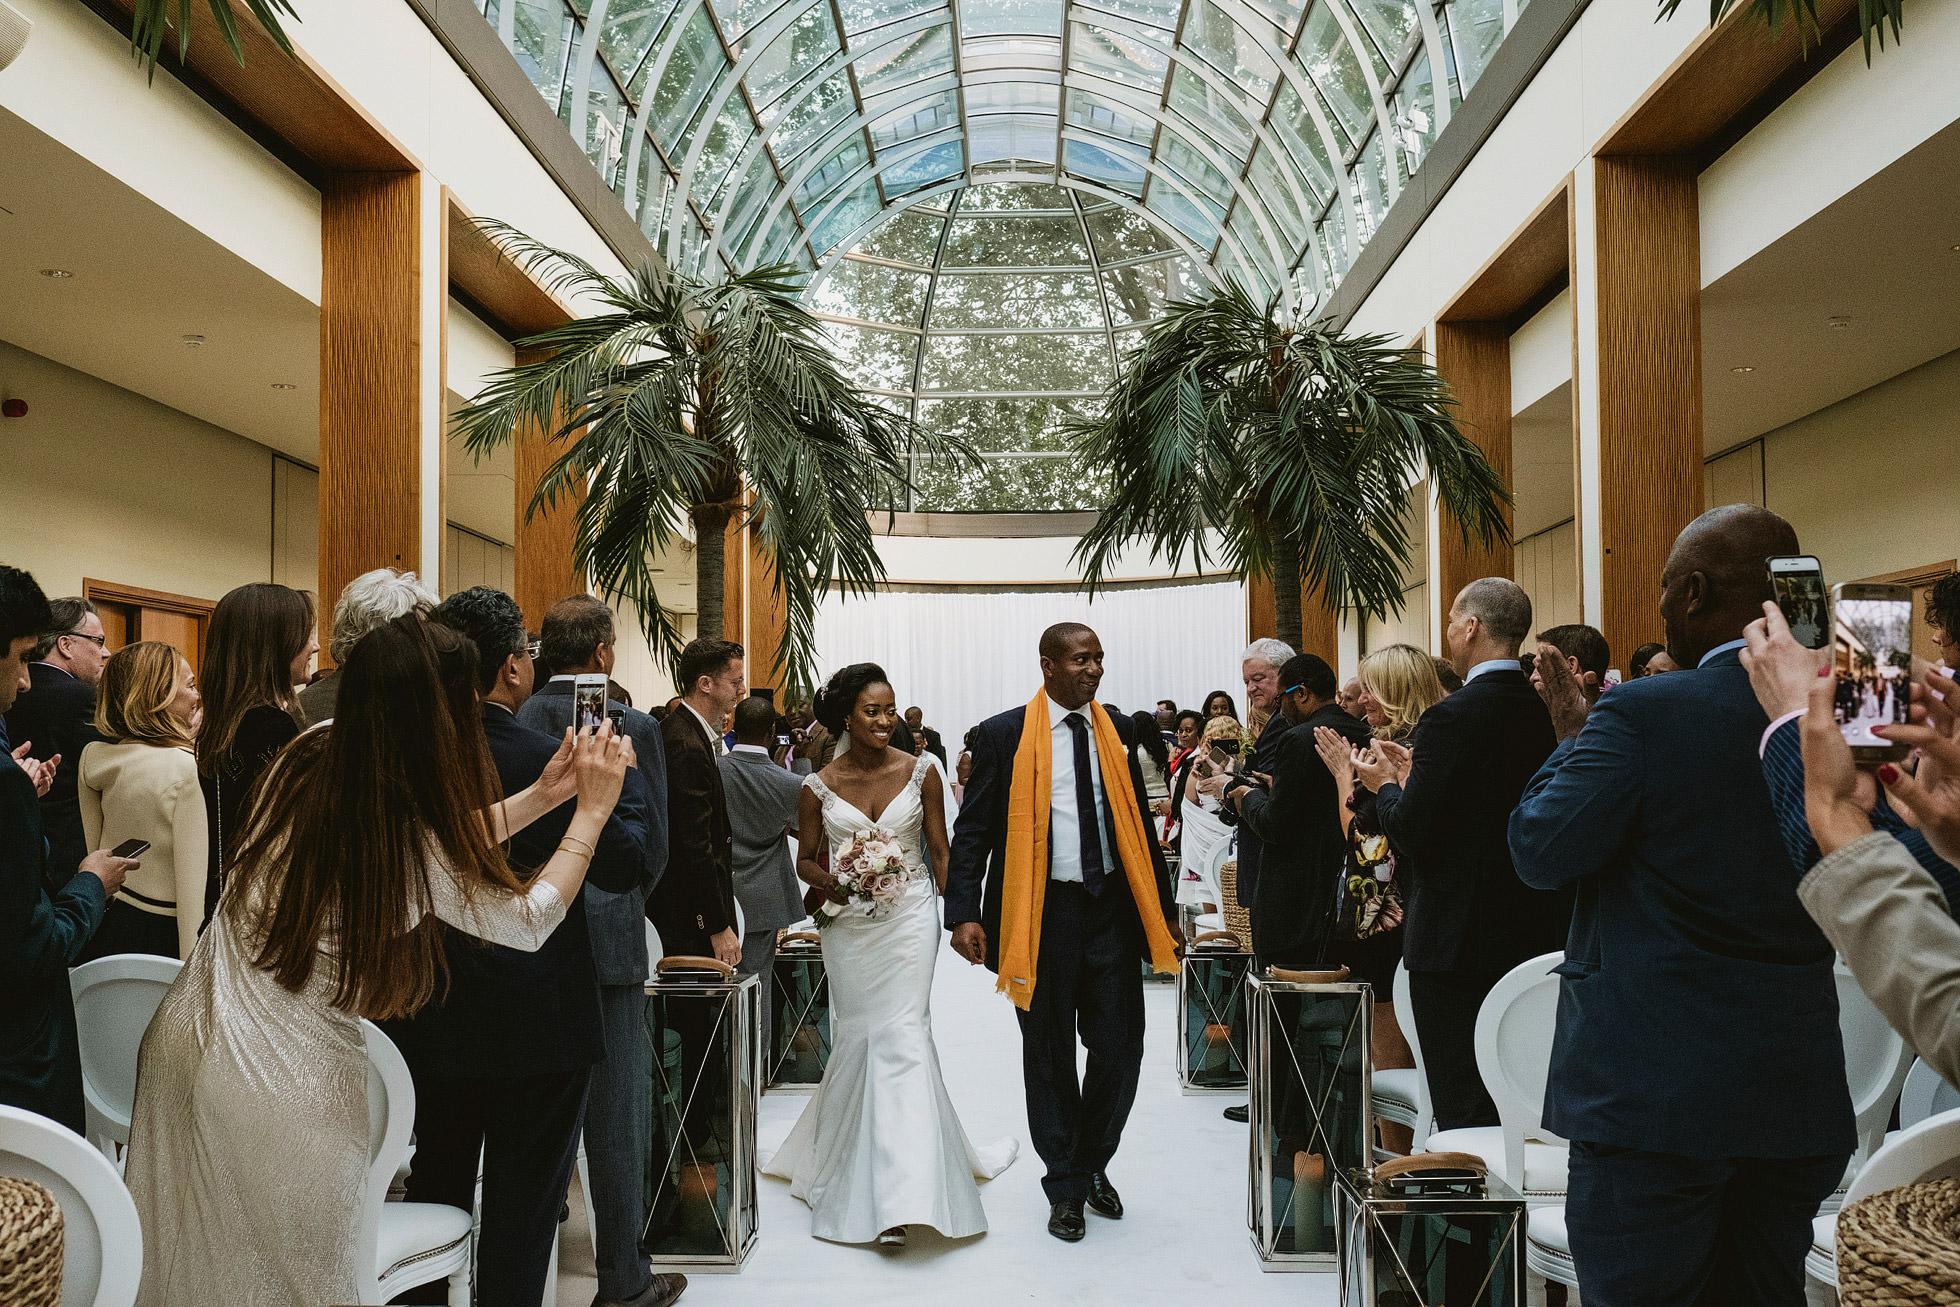 068 hurlingham club wedding photographers - The Hurlingham Club Ranelagh Gardens London Sw6 3pr